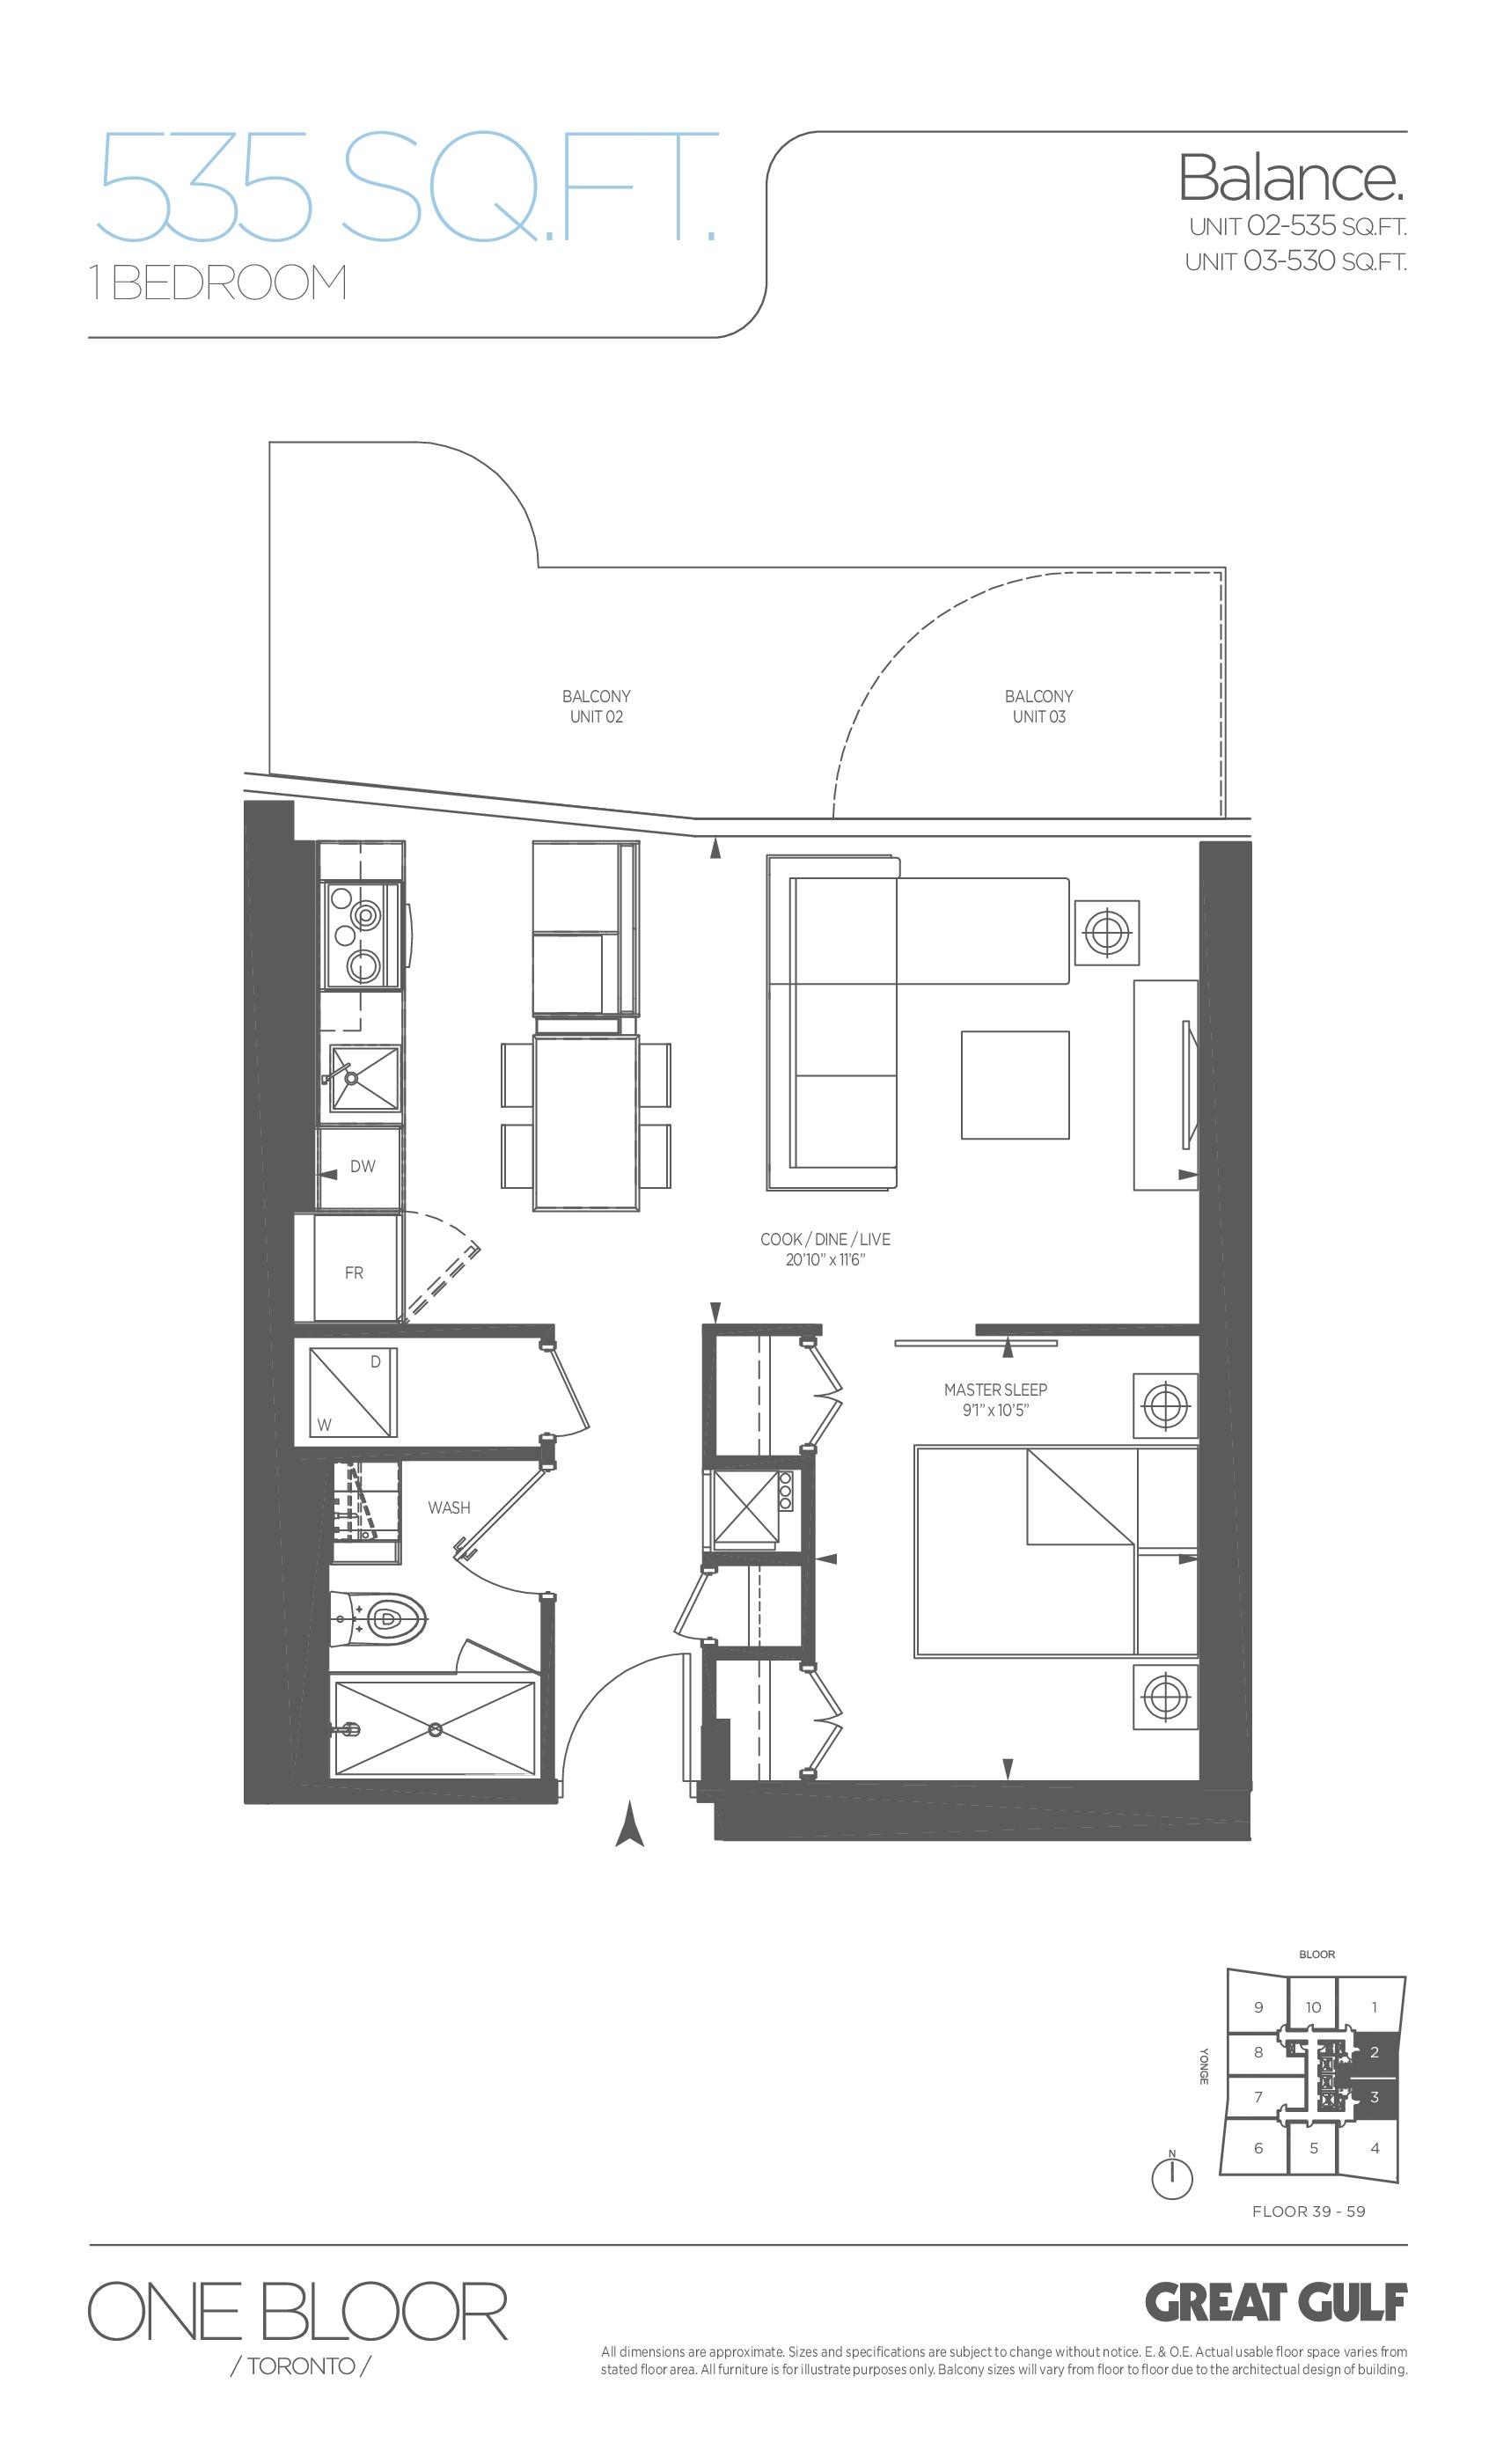 Balance Floor Plan at One Bloor Condos - 535 sq.ft